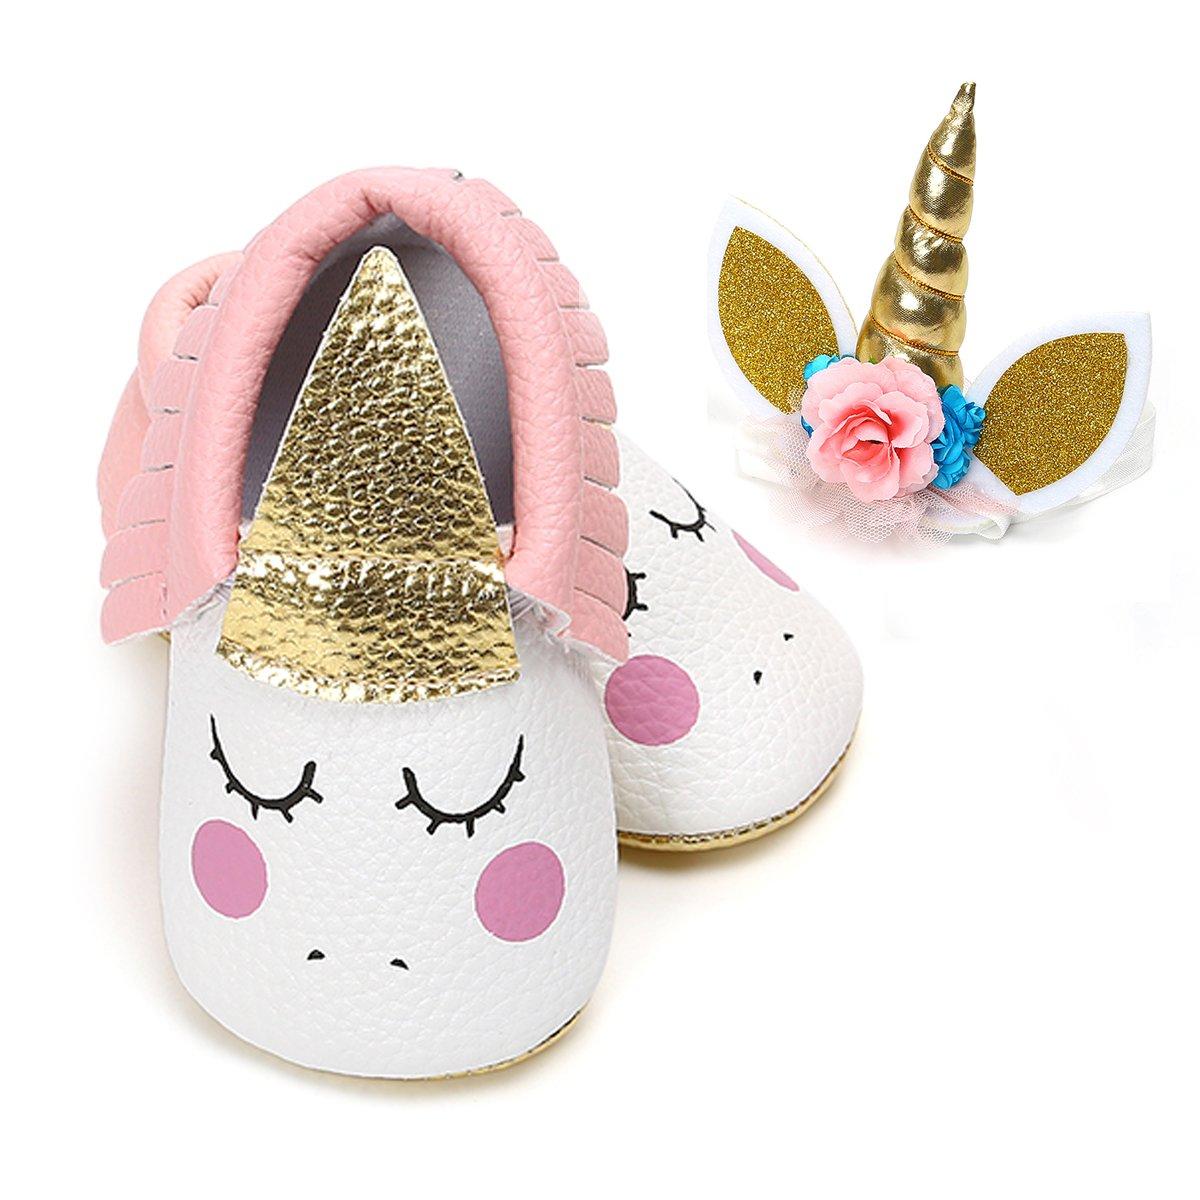 LIVEBOX Baby Premium Soft Sole InfantToddler Prewalker Anti-Slip Party Dress Crib Shoes with Free Baby Unicorn Headband